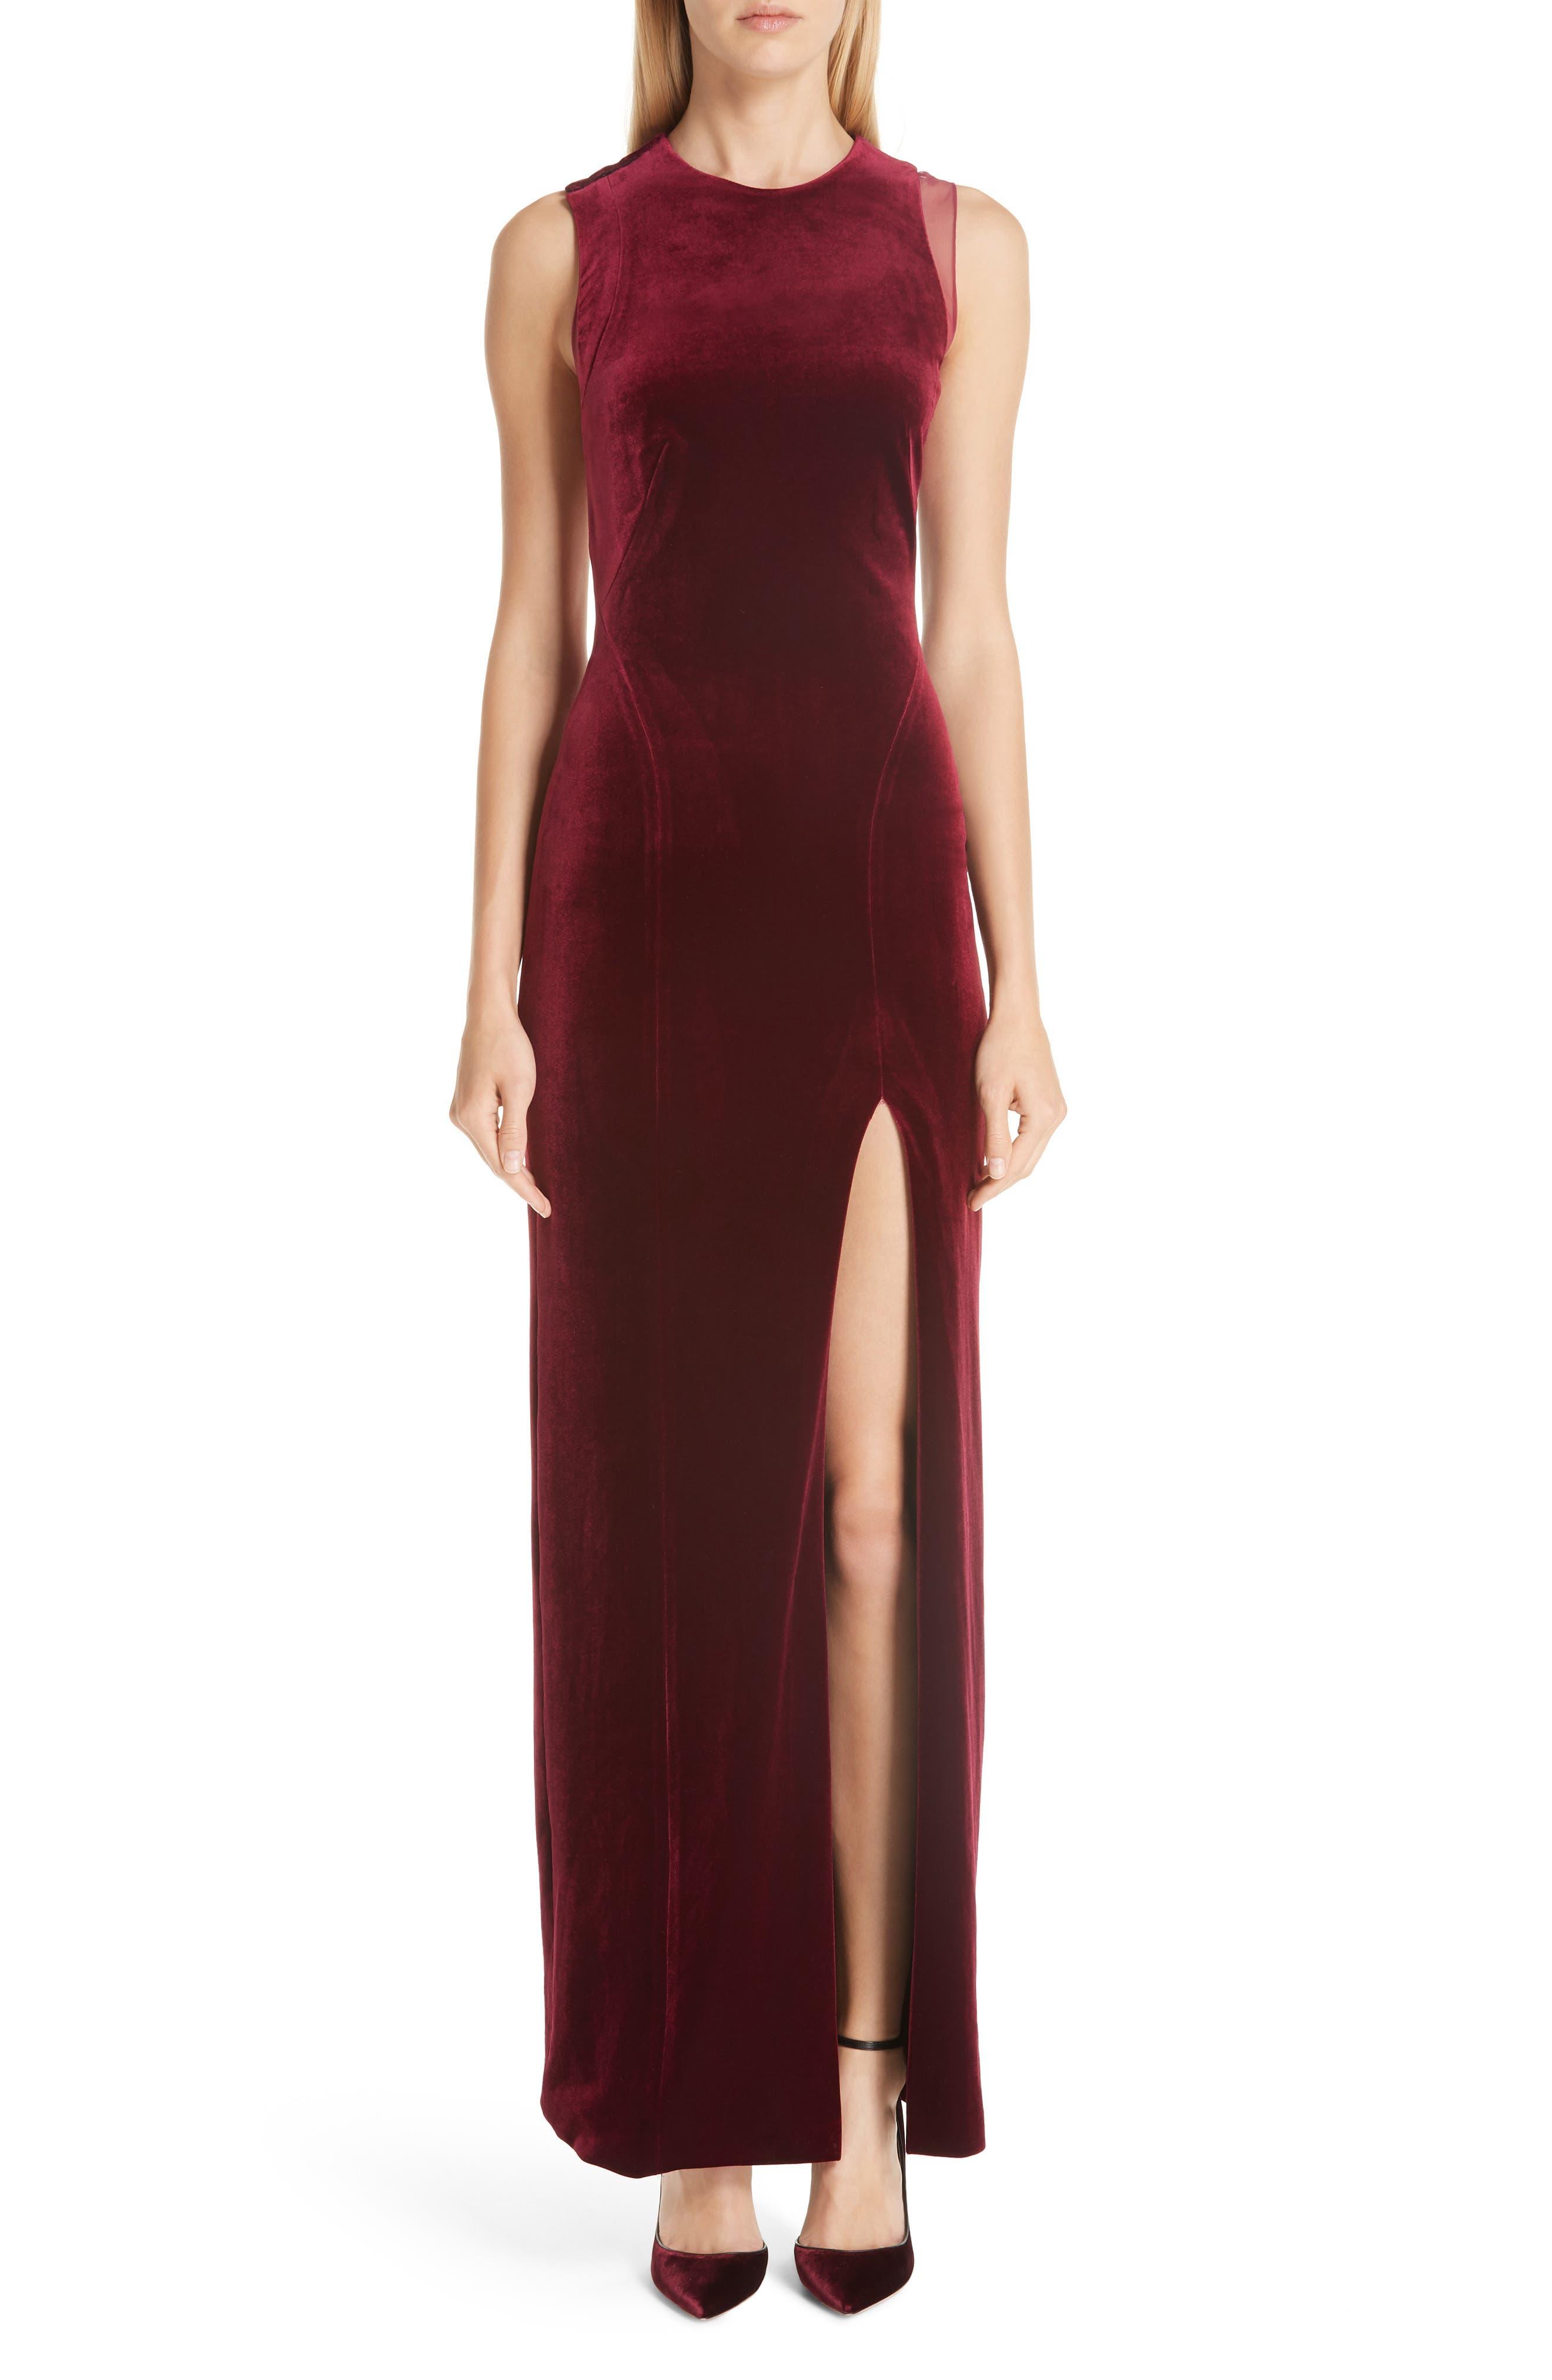 Galvan Crescent Back Cutout Gown, 4 FR - Burgundy